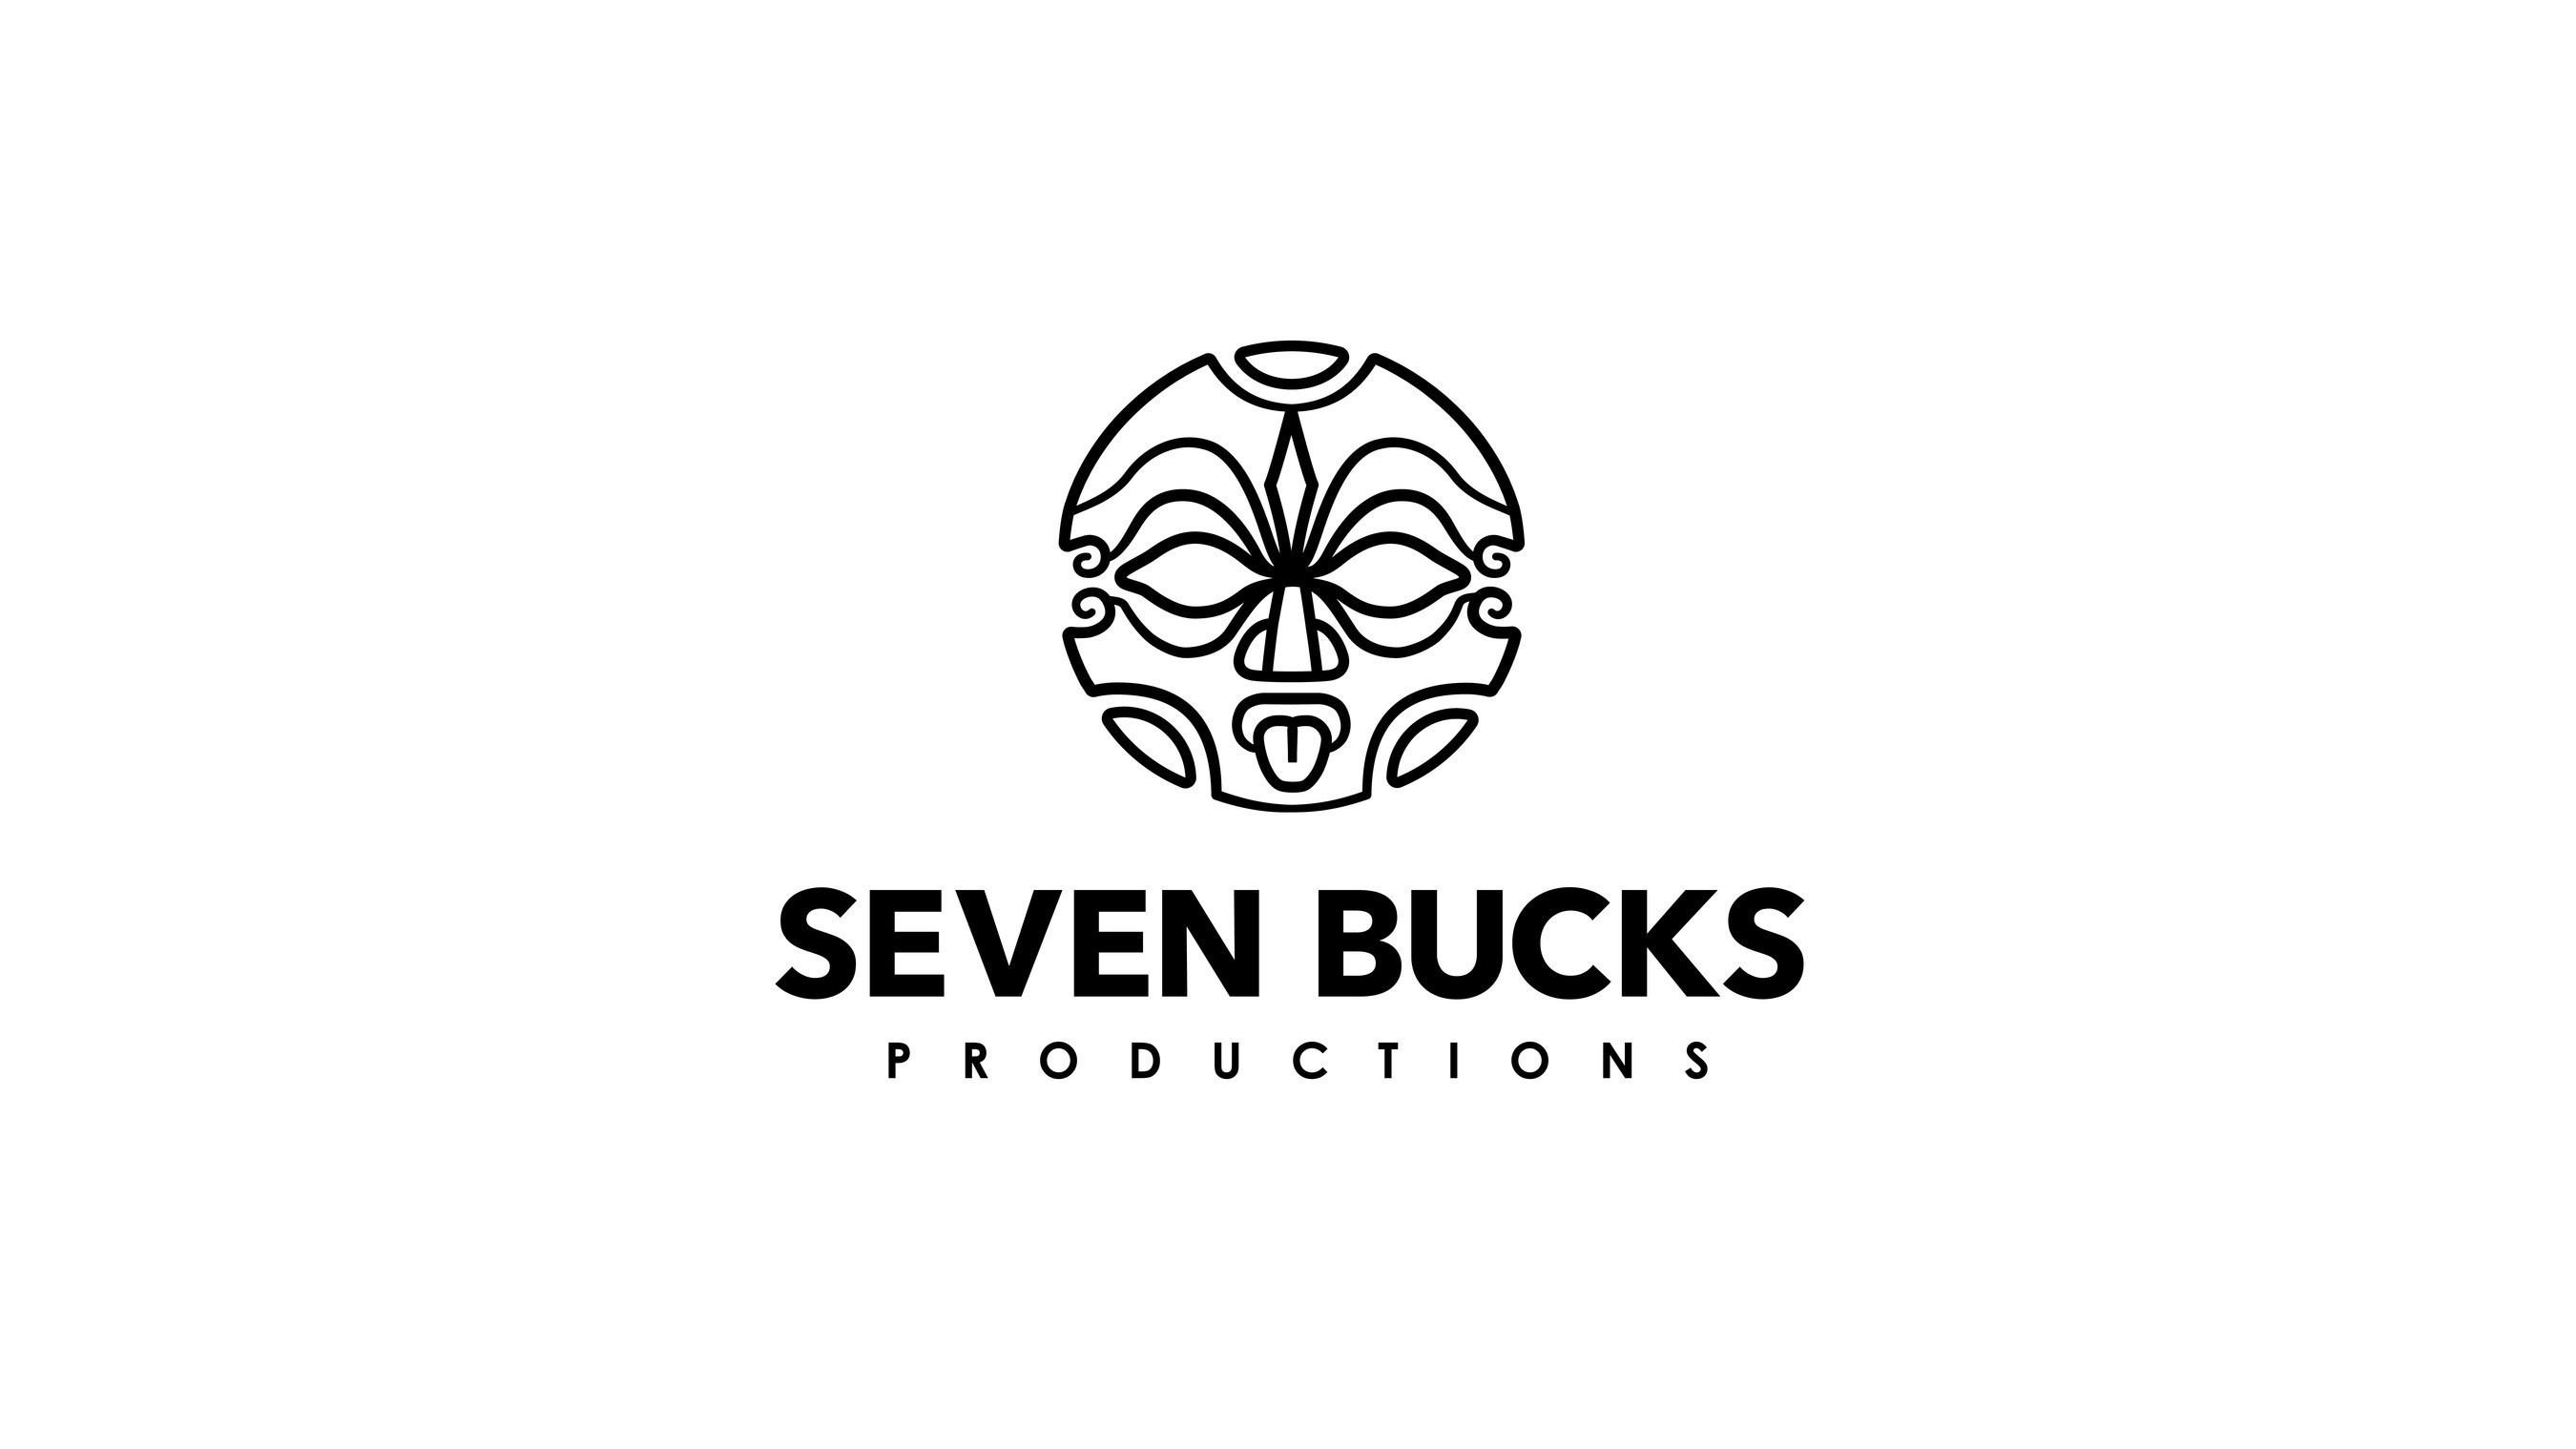 Seven Bucks Productions